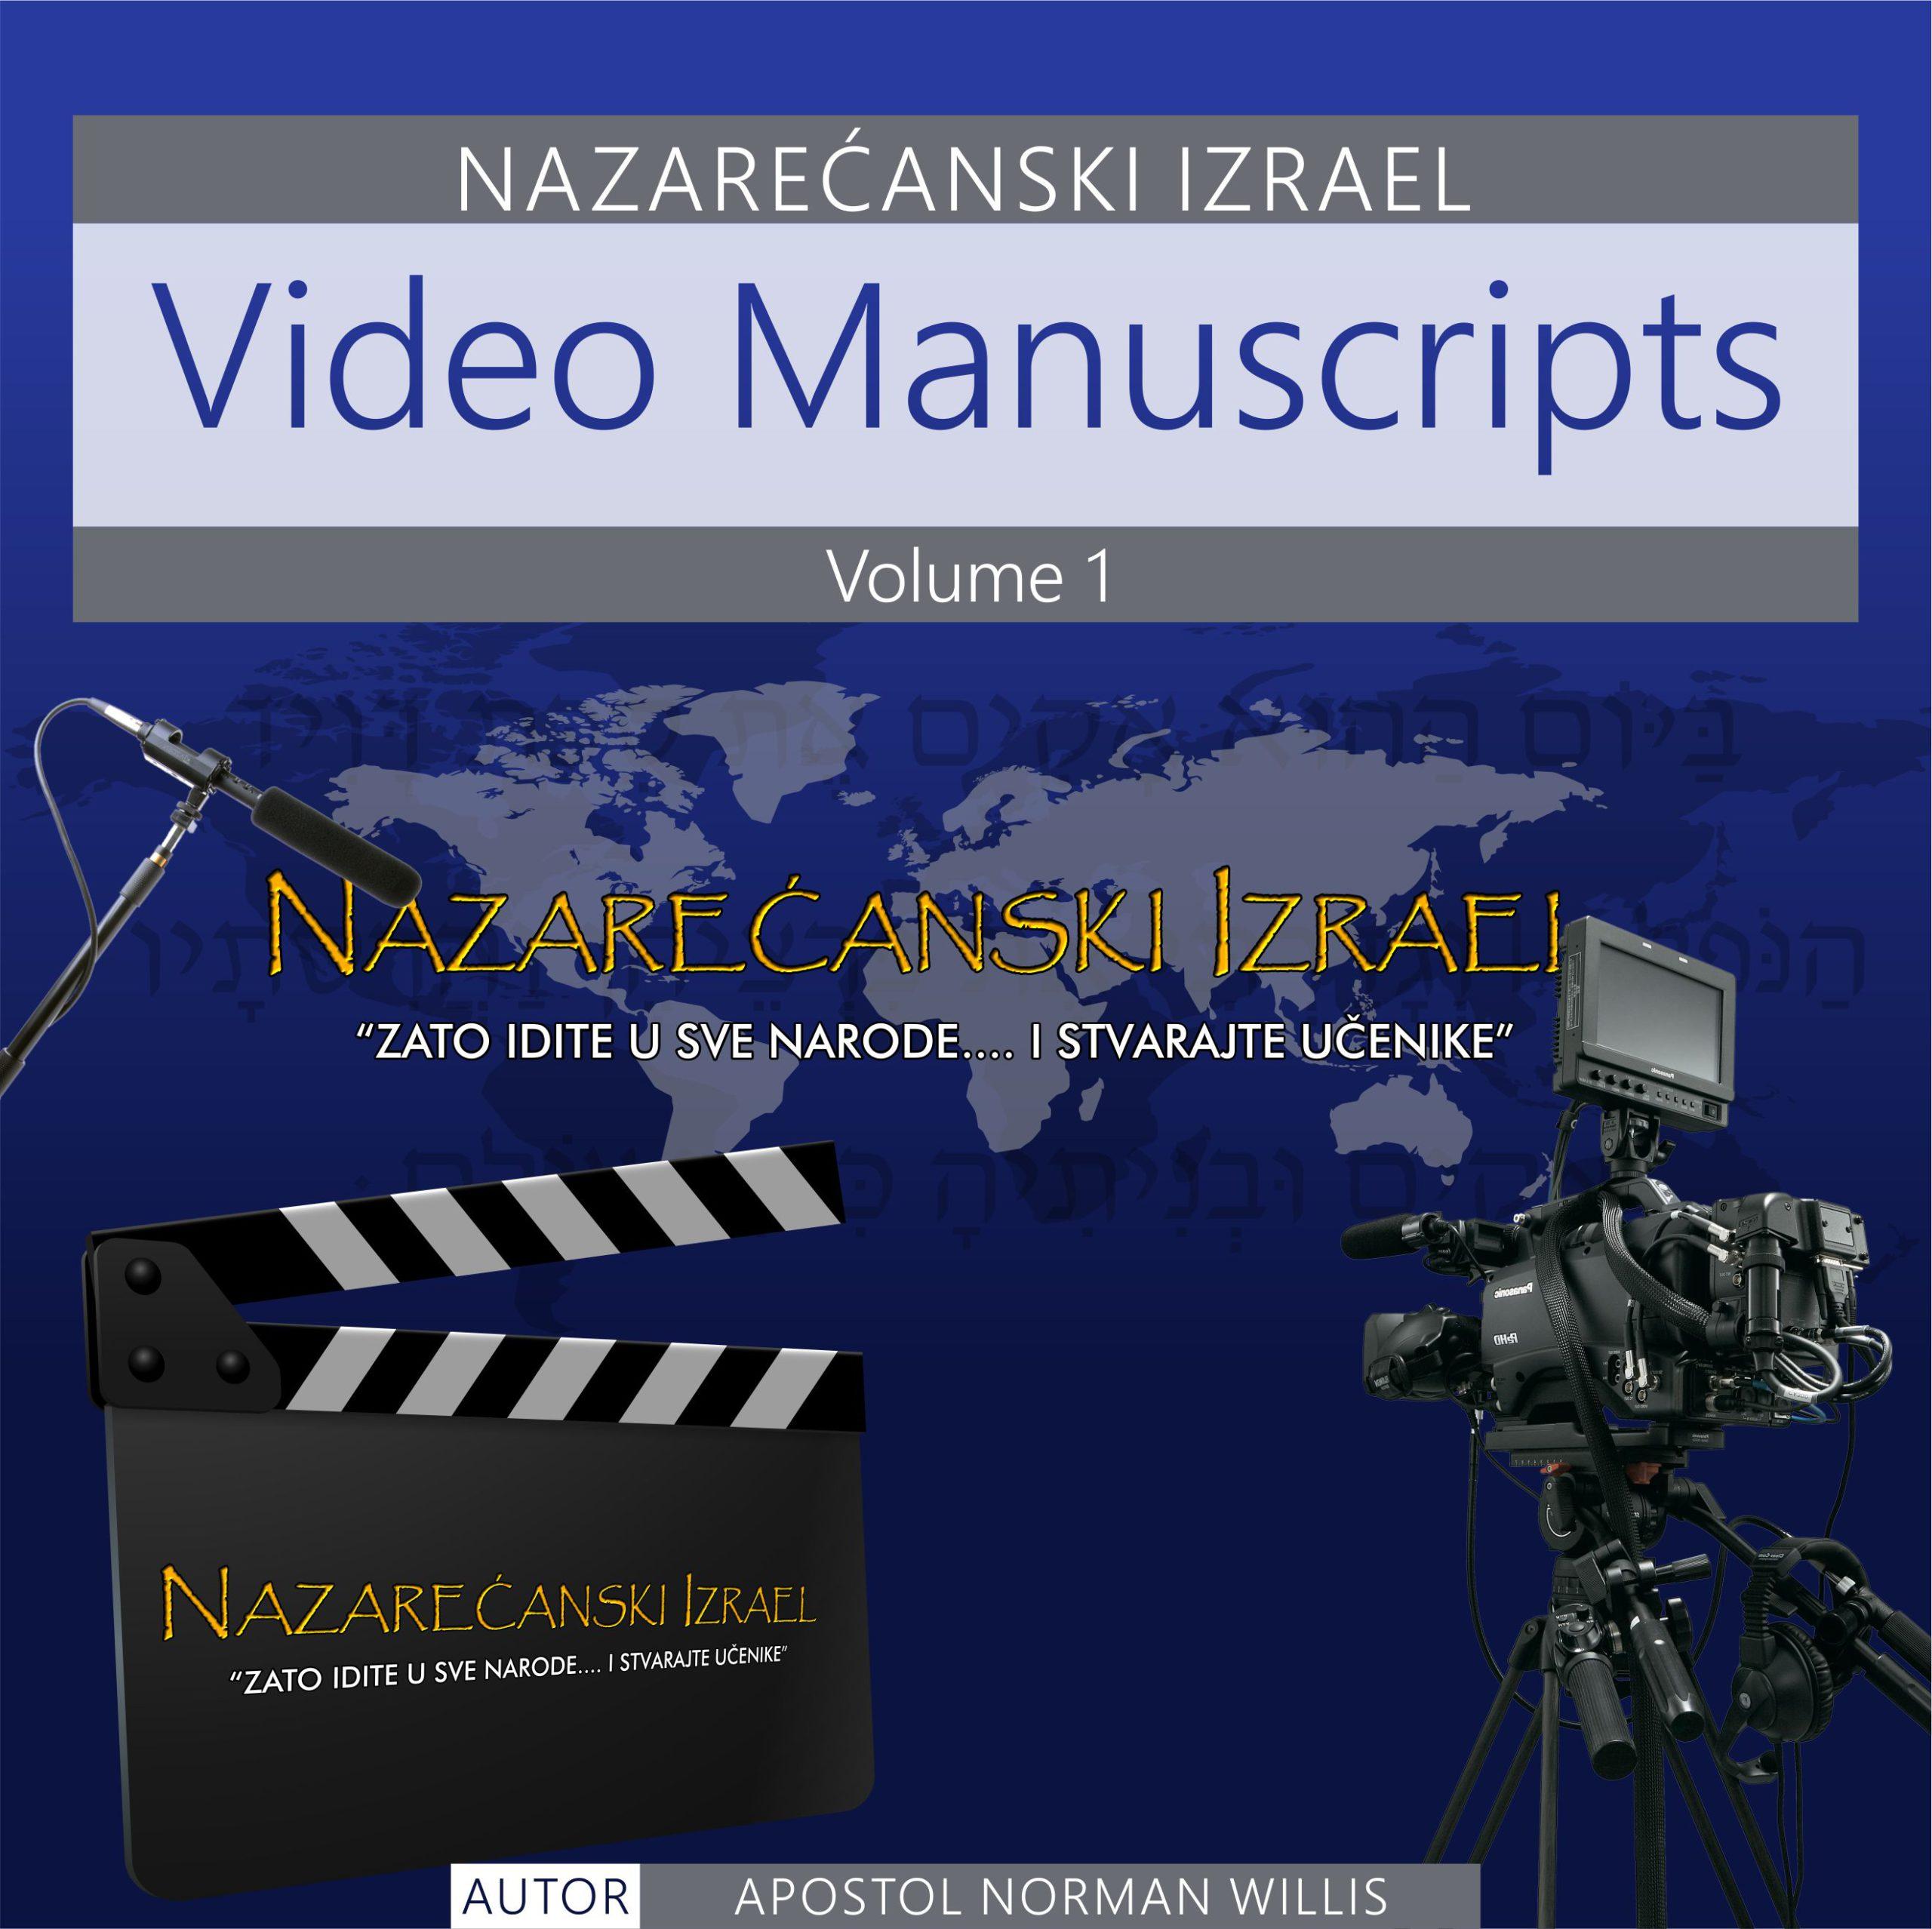 Nazarenski Izrael Video Manuscripts Volume 1